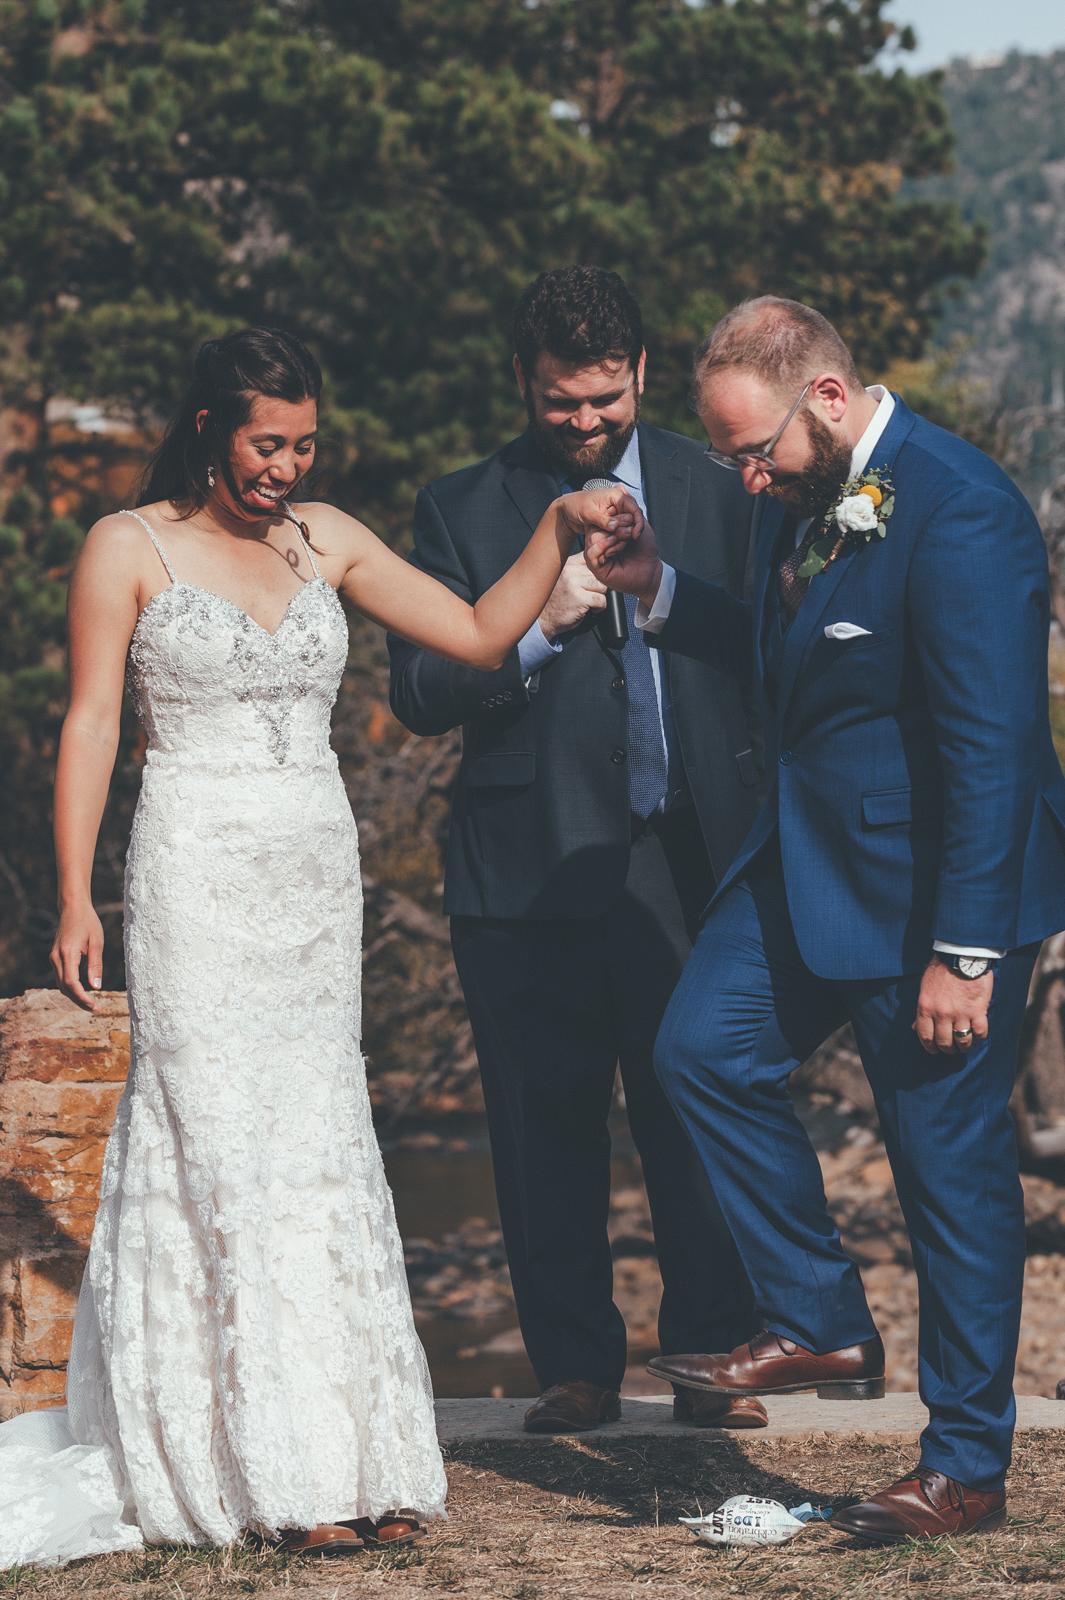 ChadFahnestockPhotography-estes-park-wedding-photography-026.jpg